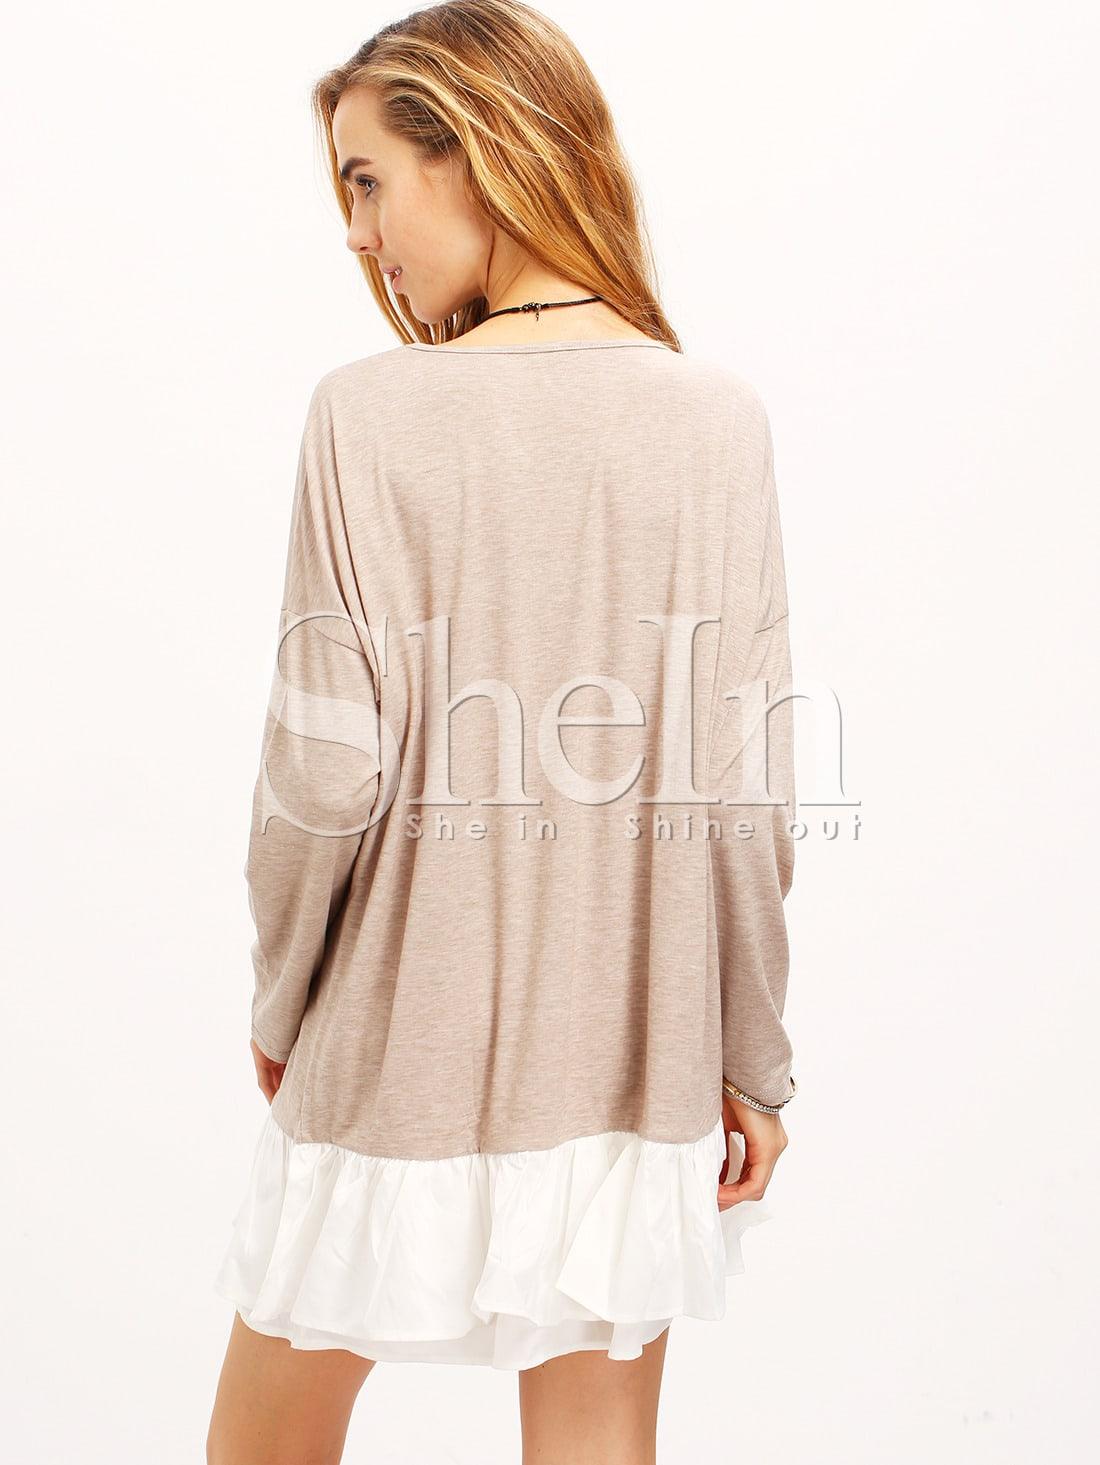 apricot neck color block dress shein sheinside